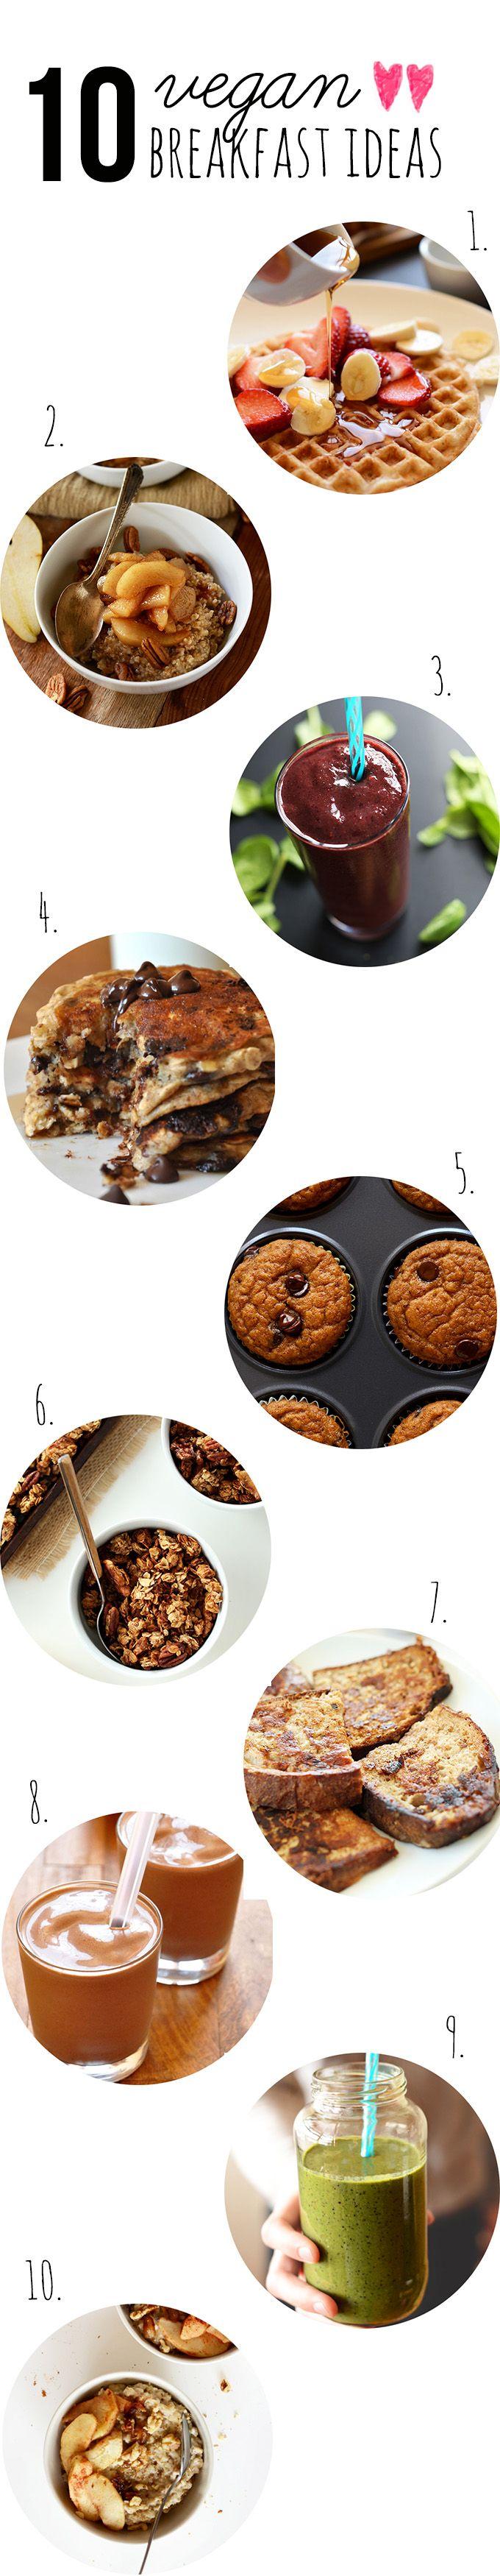 10 Vegan Breakfast Ideas! #vegan #breakfast SO GOOD